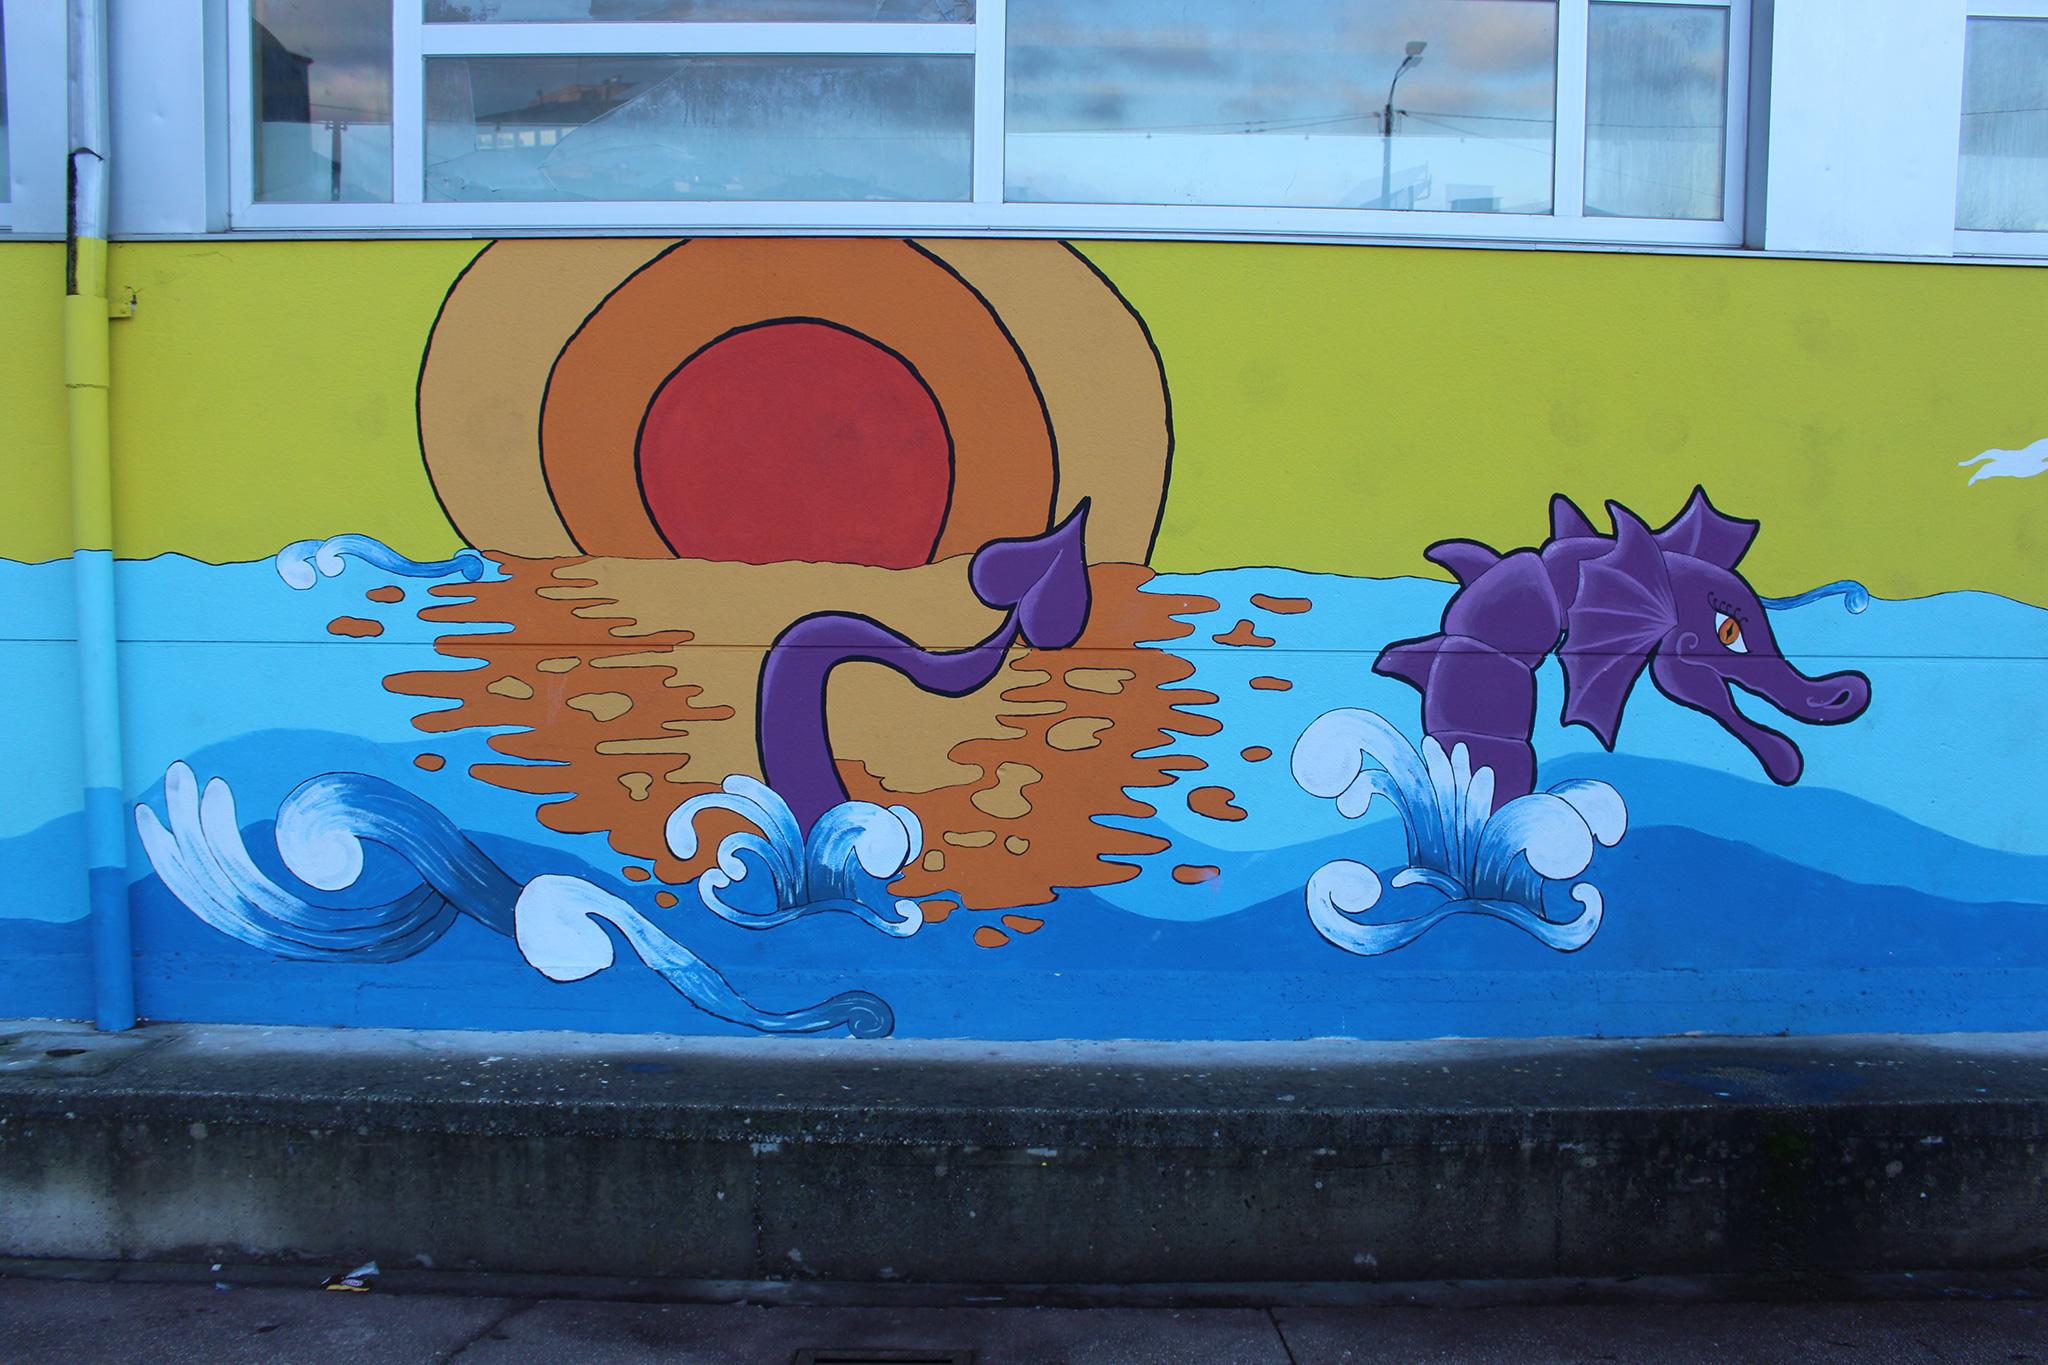 Foto principal mural Mar de lenda